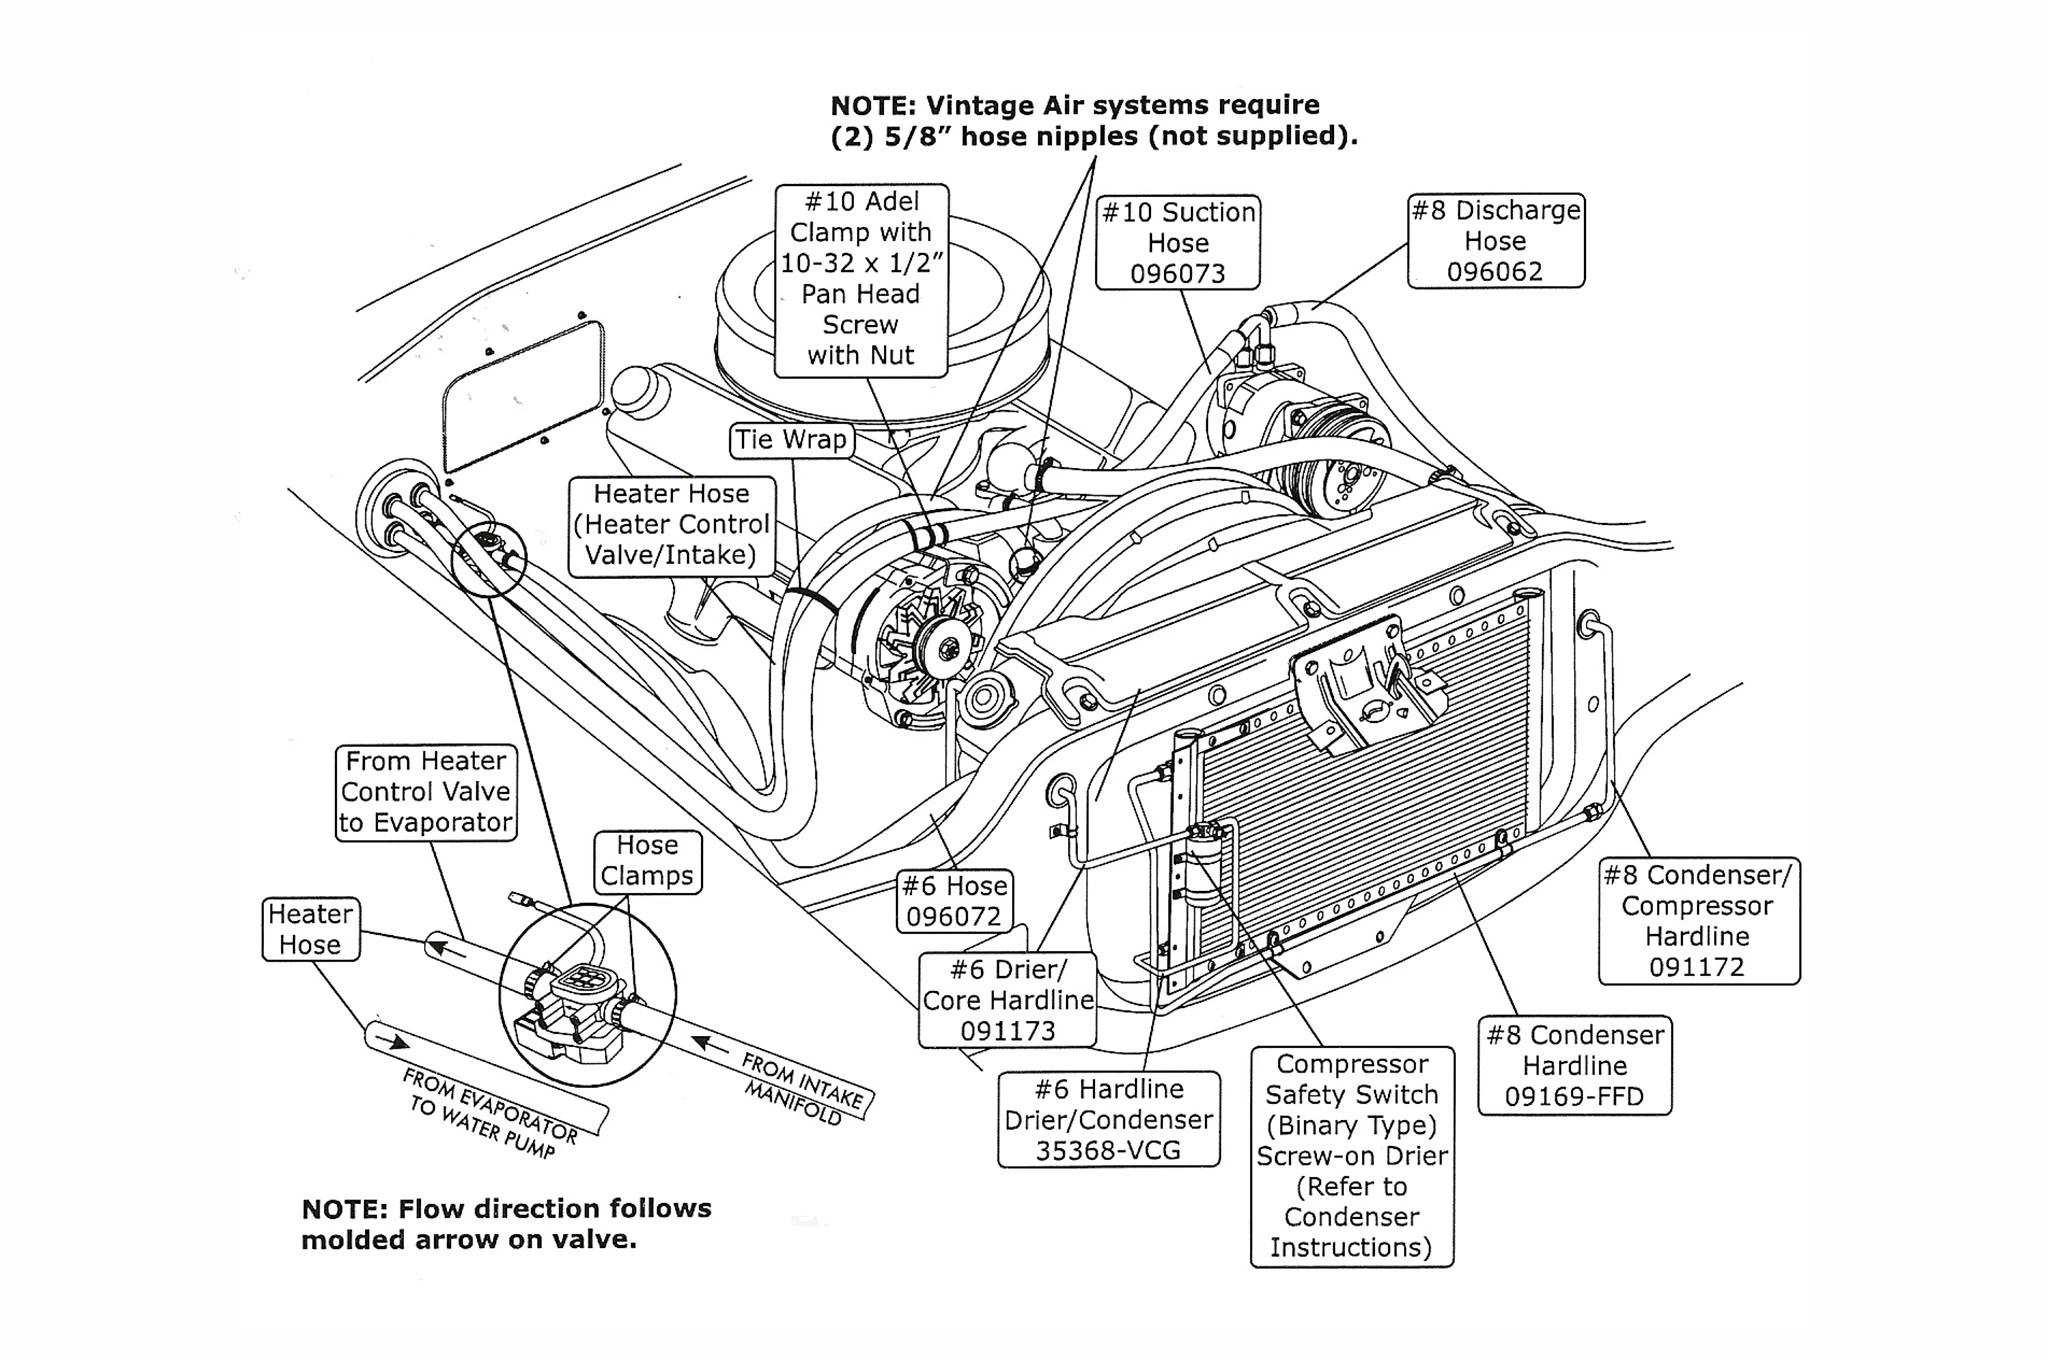 1970 chevelle ac wiring diagram easy wiring diagrams u2022 chevelle engine wiring diagrams 70 chevelle [ 2048 x 1360 Pixel ]